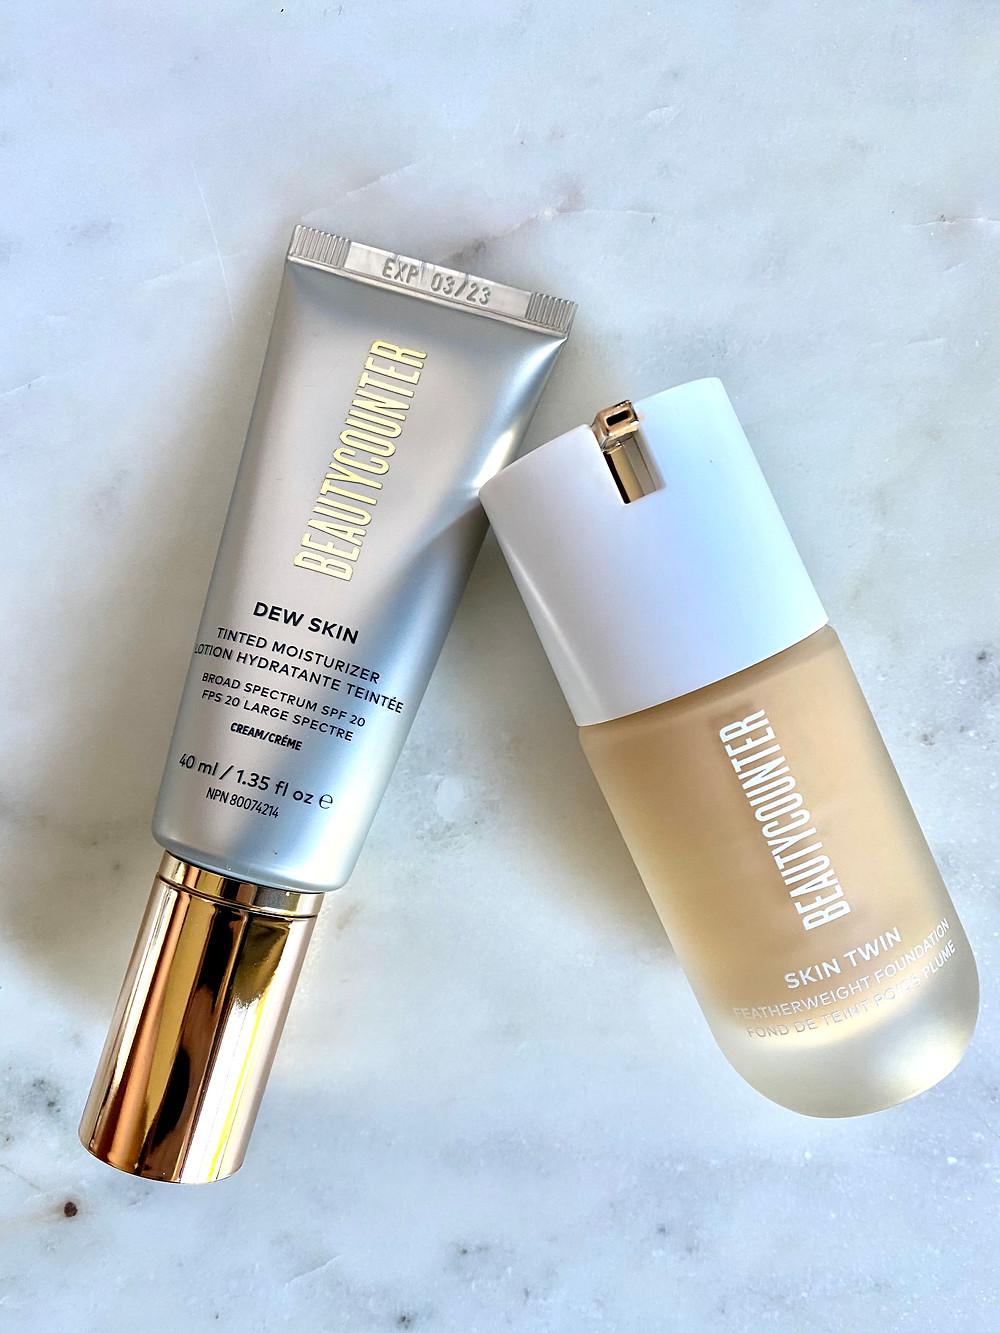 Beautycounter Dew Skin Tinted Moisturizer vs Skin Twin Foundation